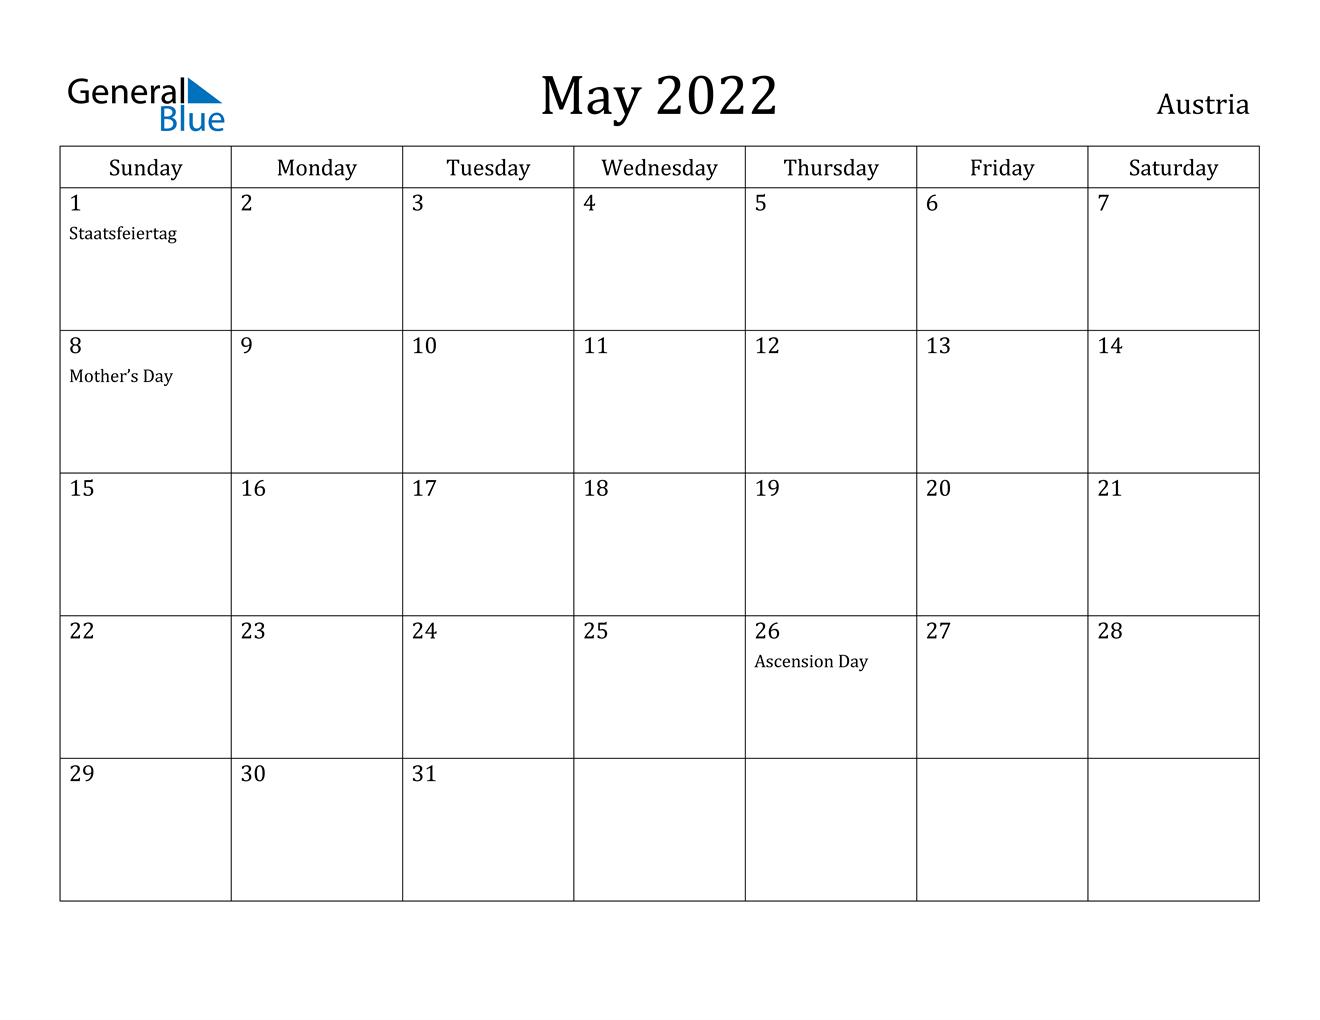 May 2022 Calendar - Austria inside May 2022 Calendar Template Image